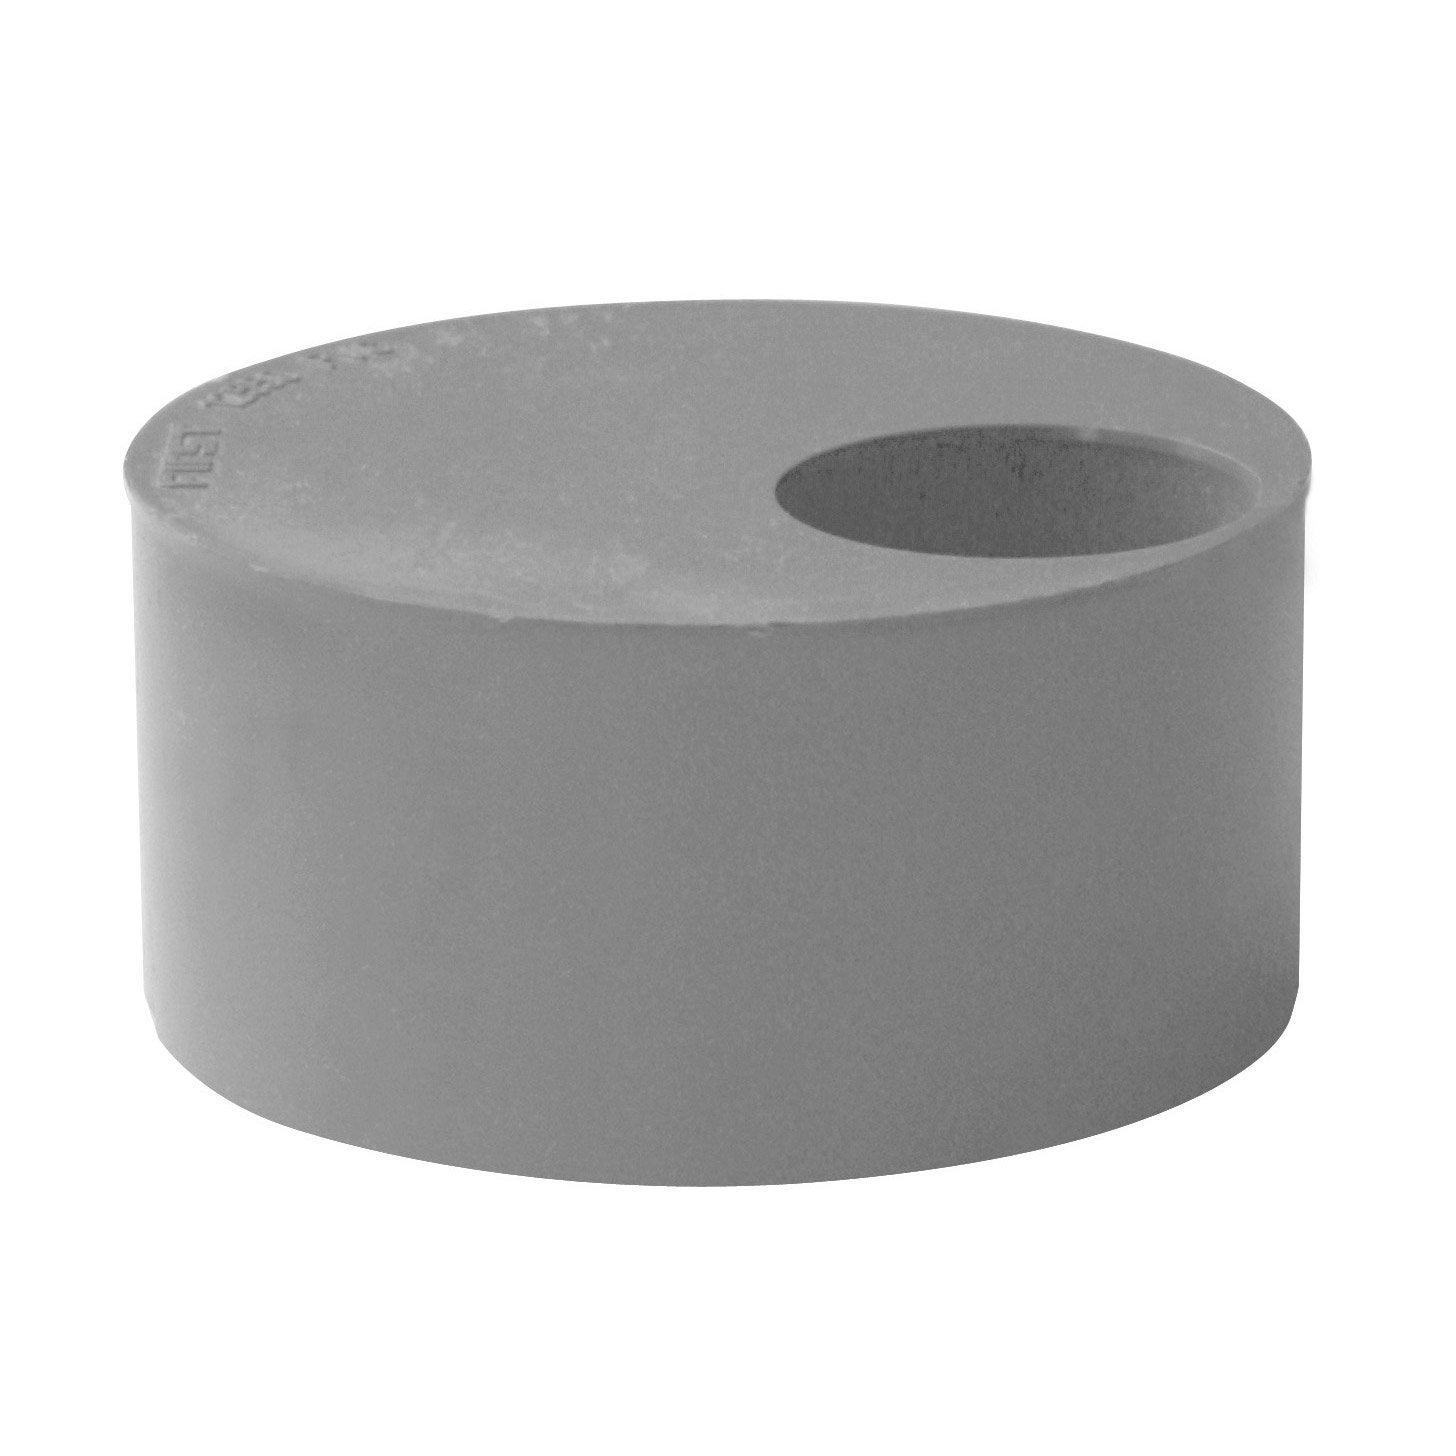 tampon de r duction simple pvc mm first plast leroy merlin. Black Bedroom Furniture Sets. Home Design Ideas